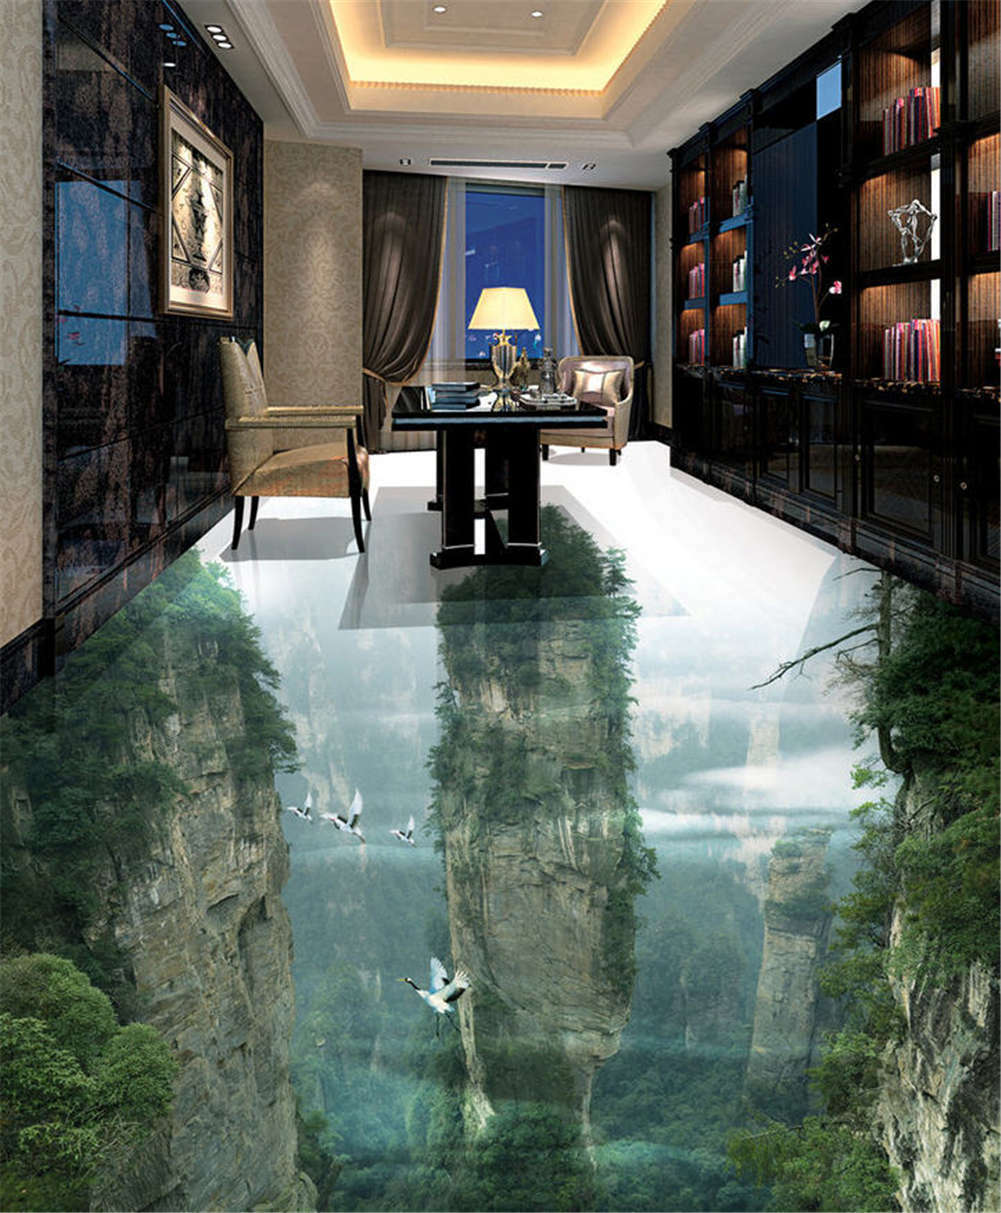 Harm Of Nature 3D Floor Mural Photo Flooring Wallpaper Home Print Decoration